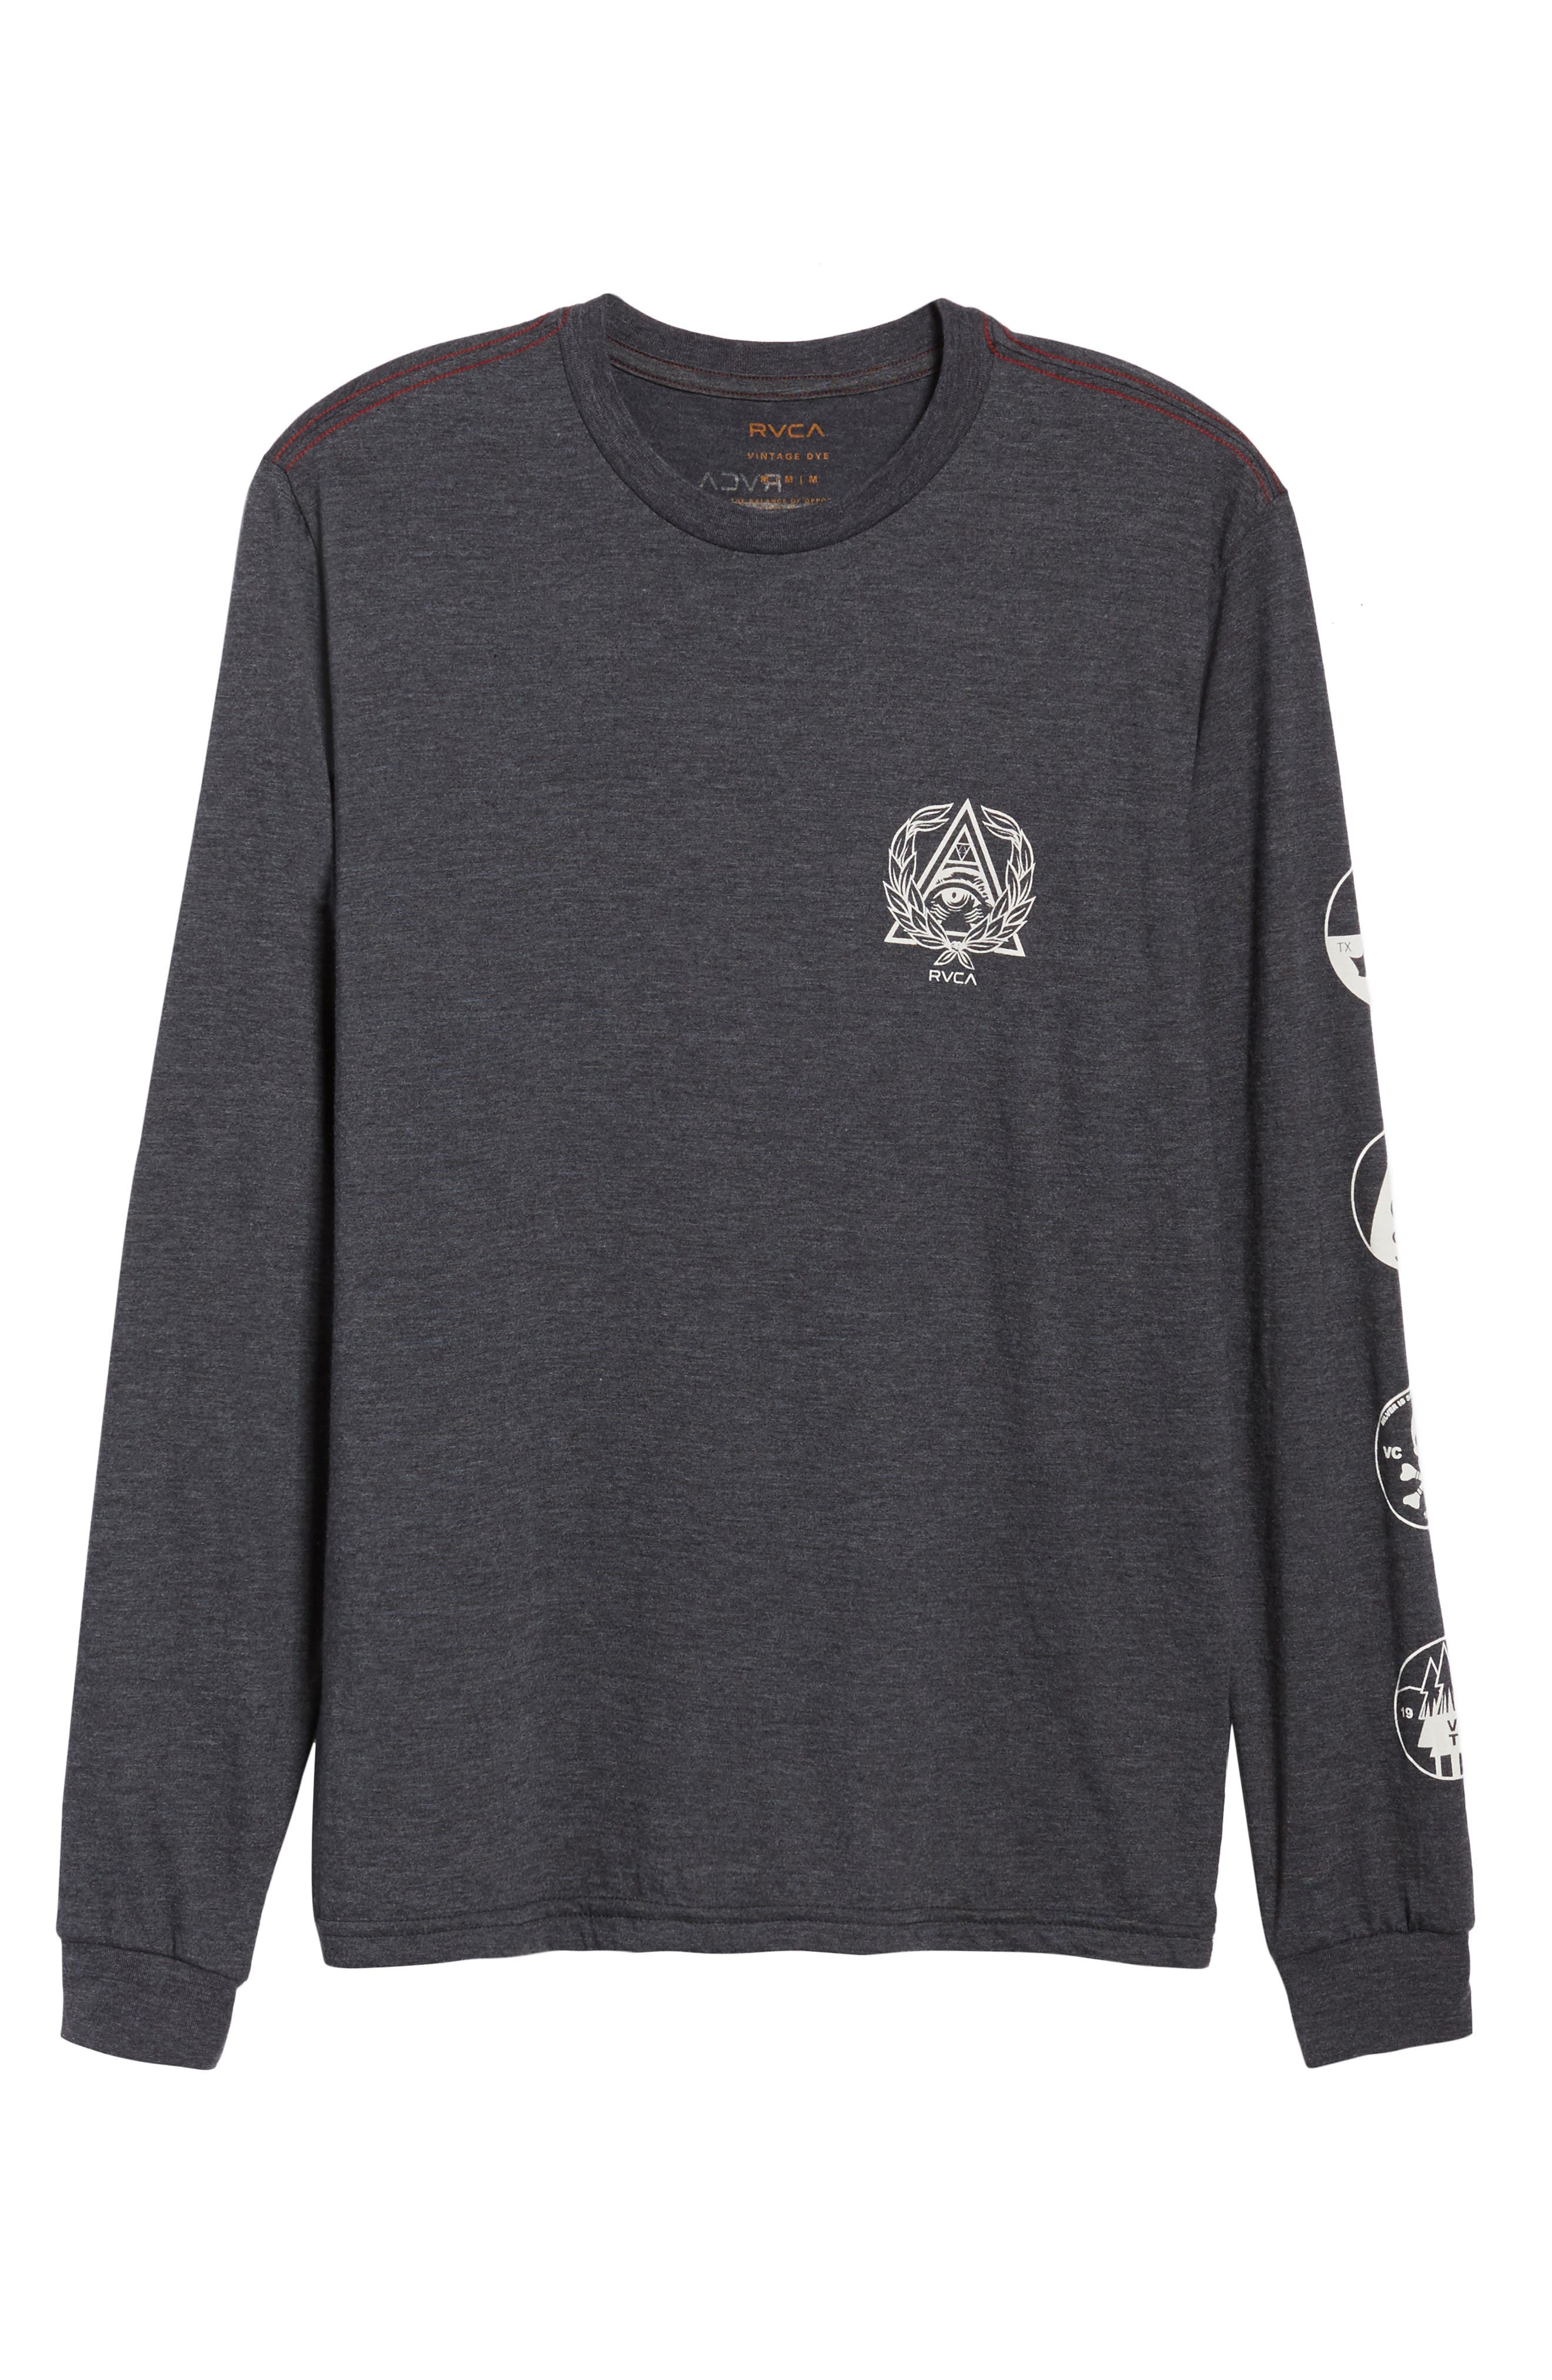 Prigus Sport Team T-Shirt,                             Alternate thumbnail 6, color,                             001